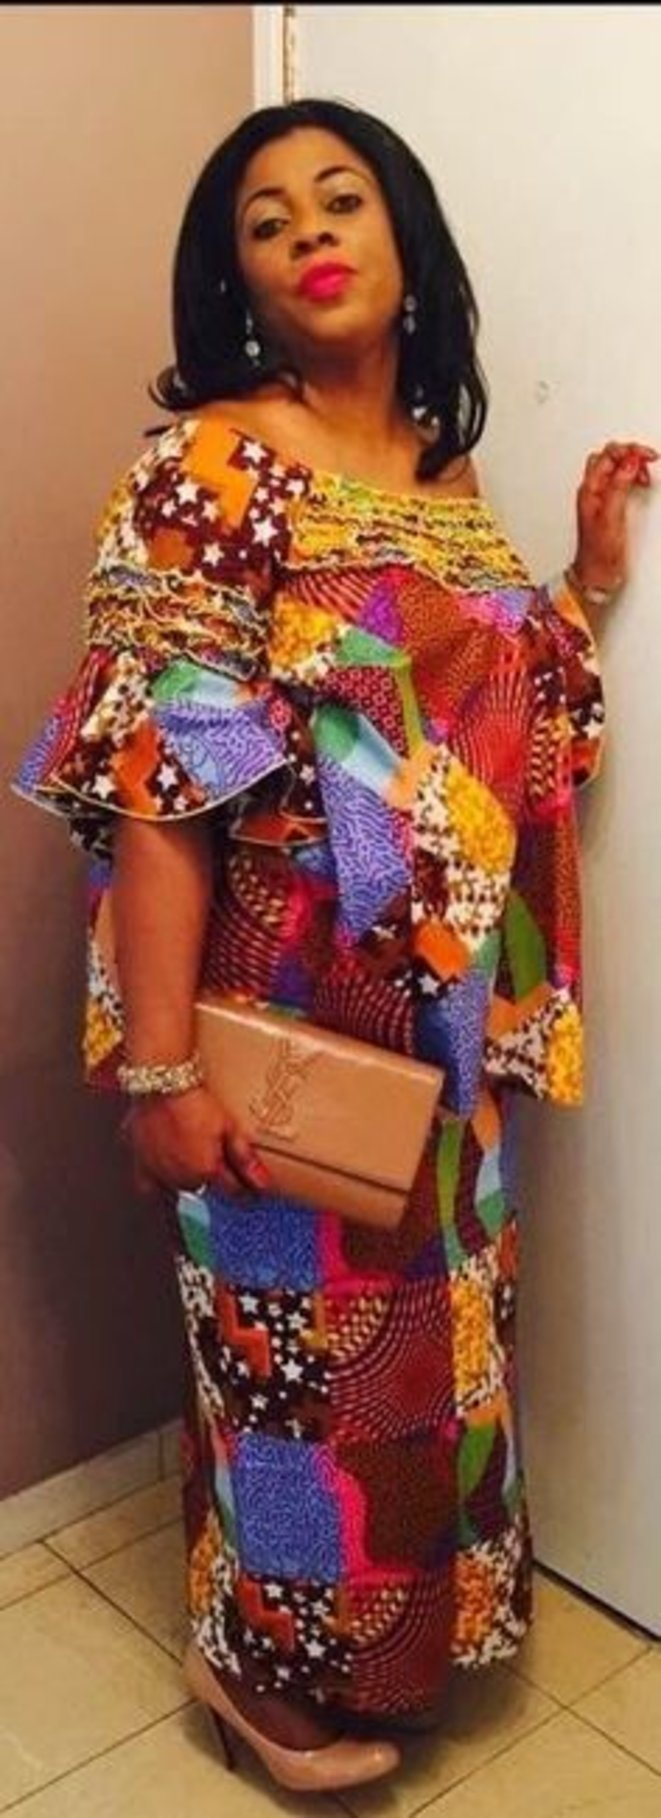 freddy-mulongo-mama-congolaises-8